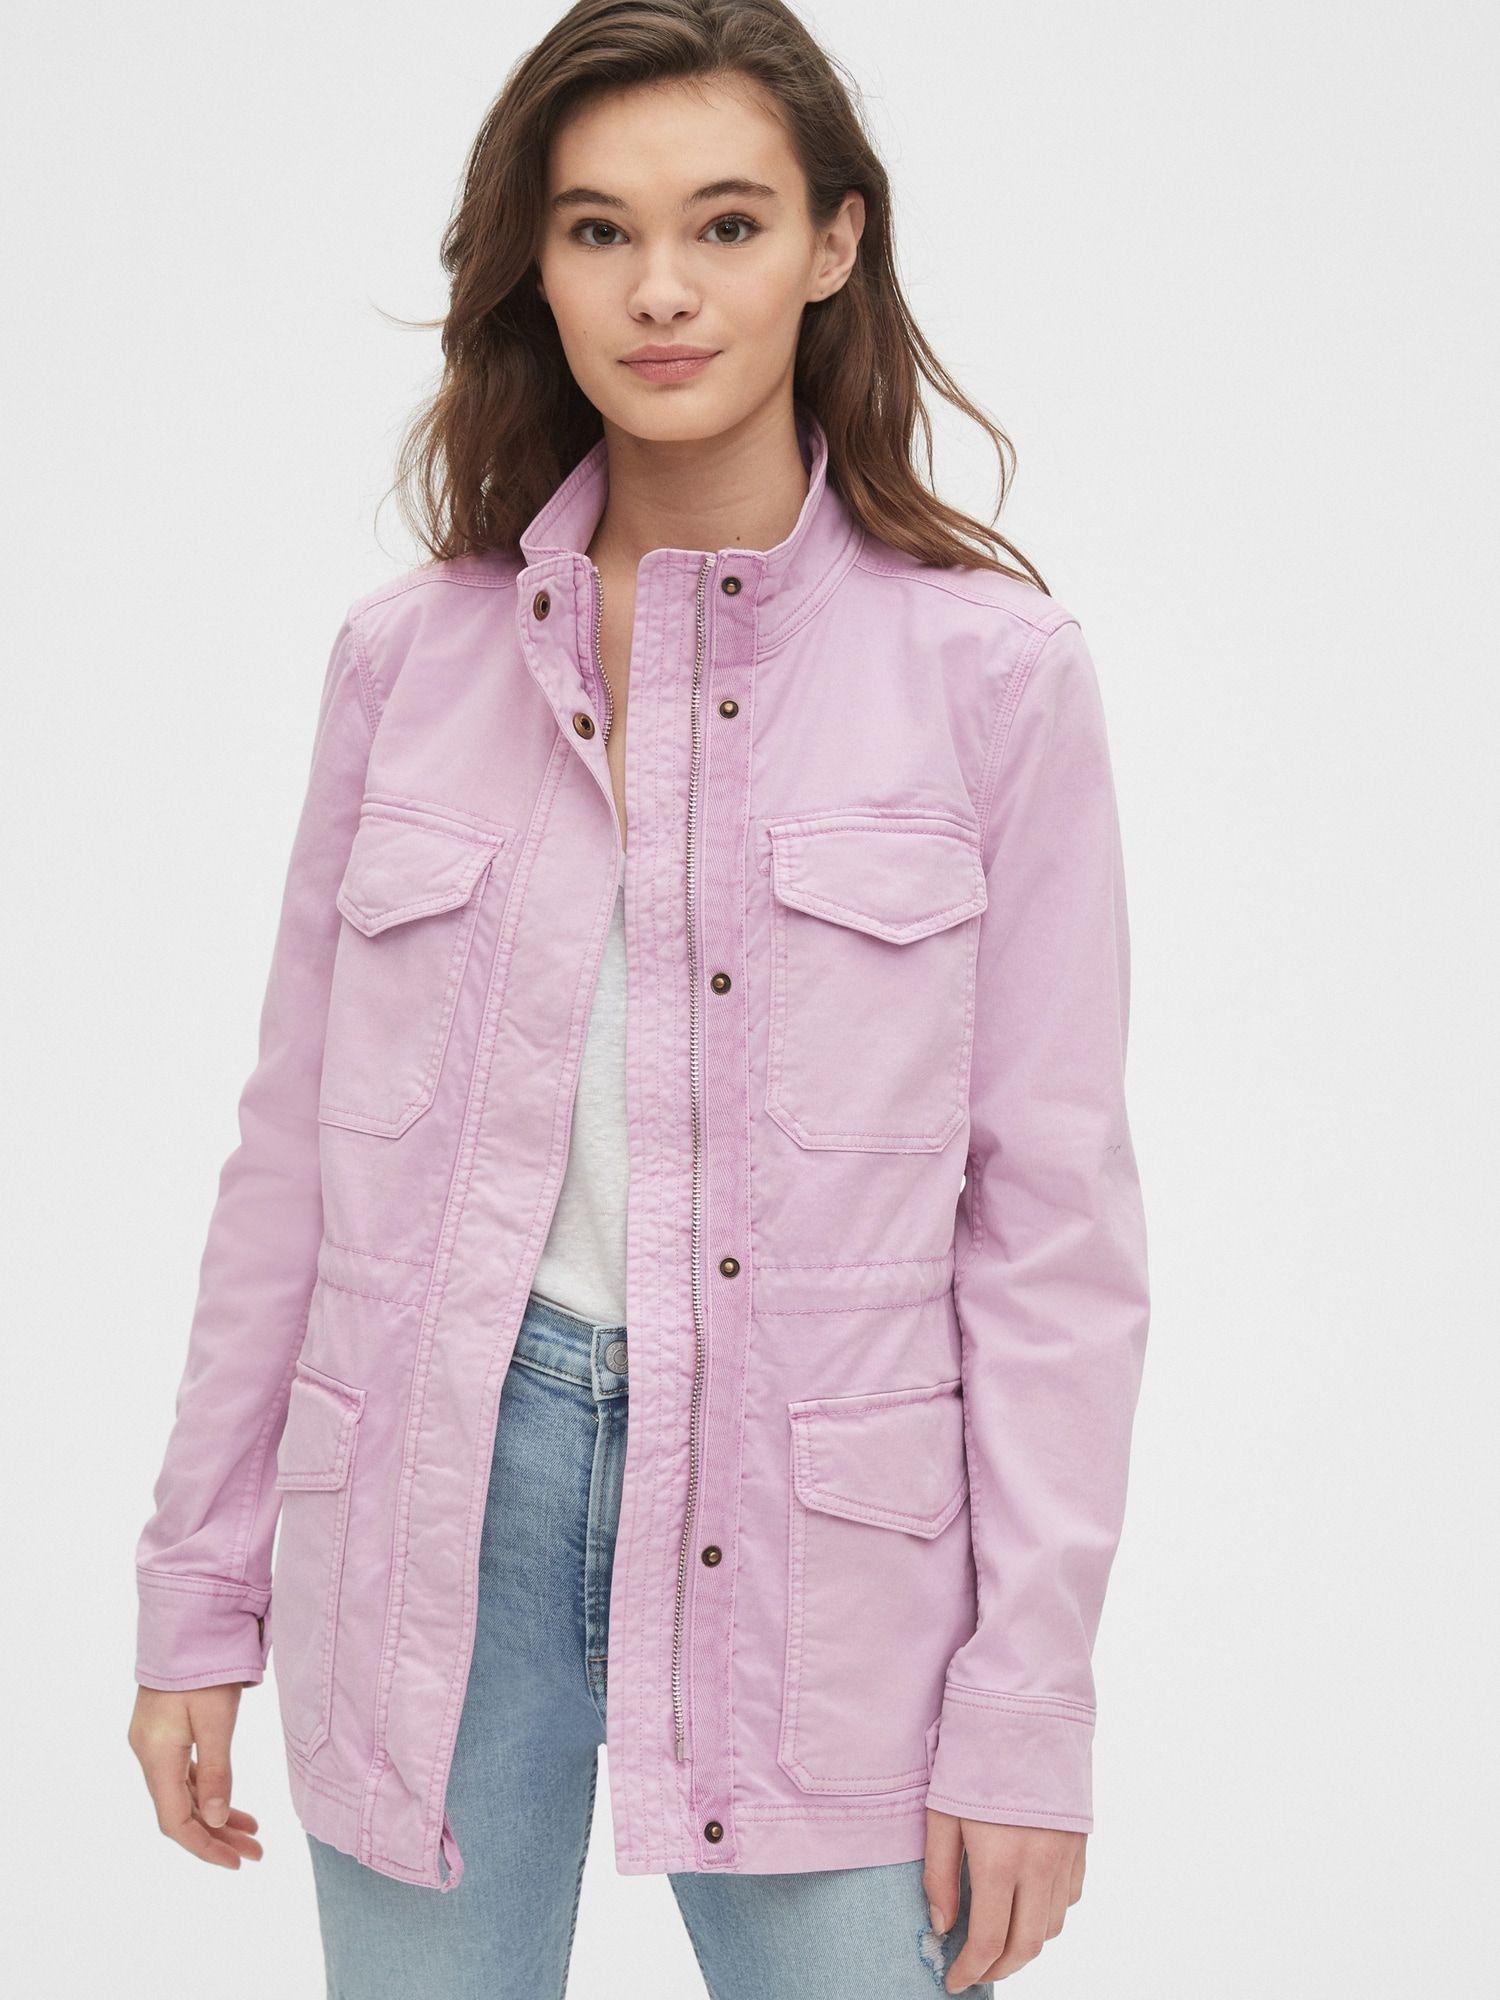 Utility Jacket Gap Fashion Spring Jackets Coats Jackets Women [ 2000 x 1500 Pixel ]